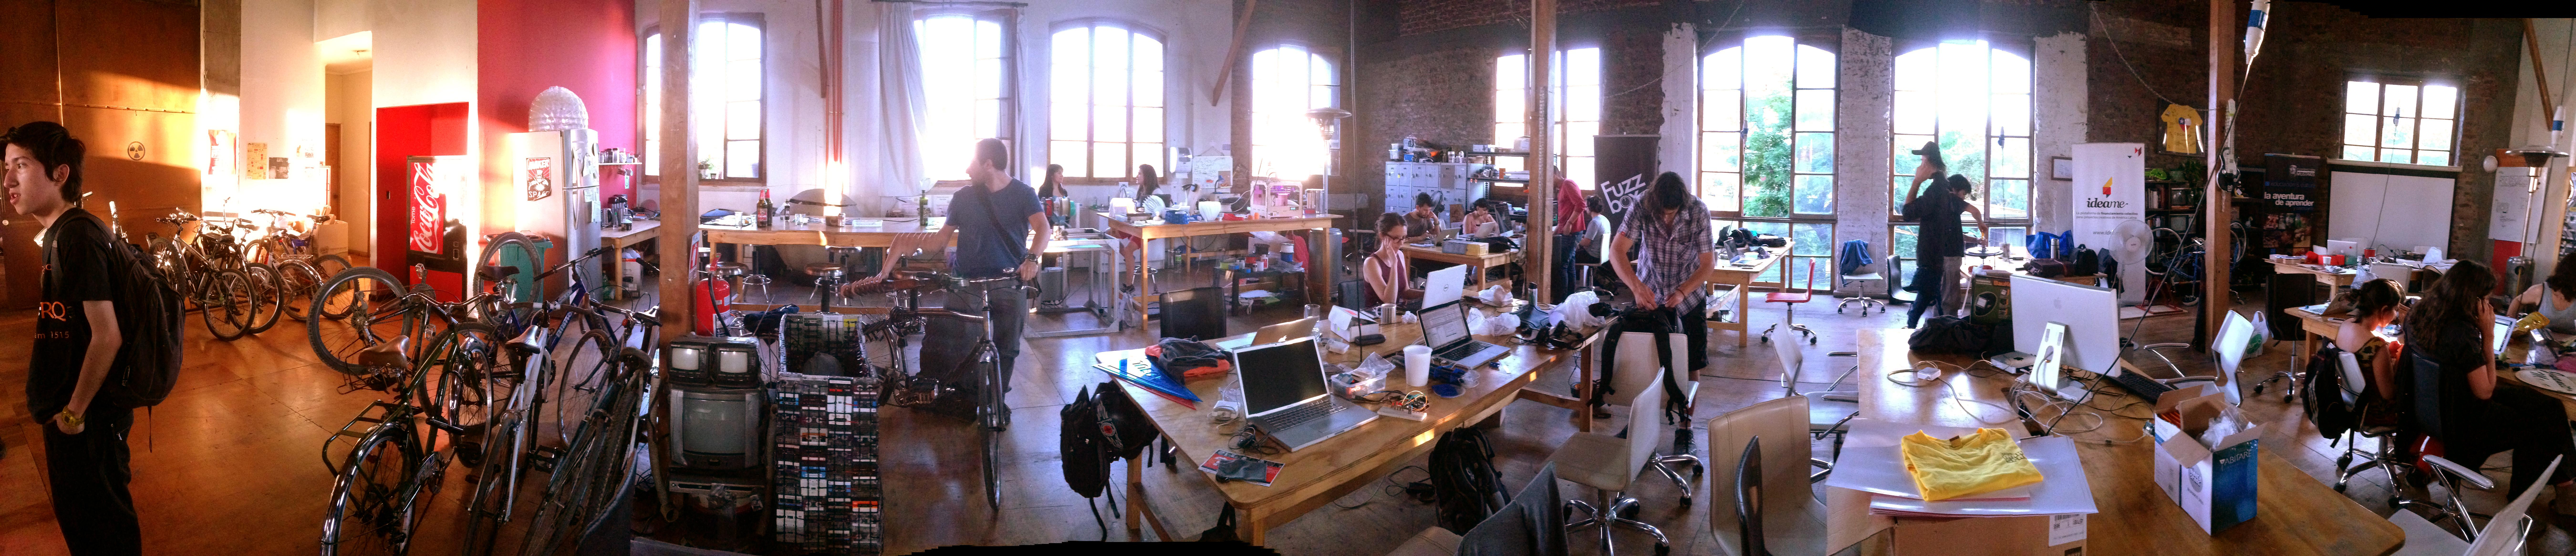 Santiago Maker Space